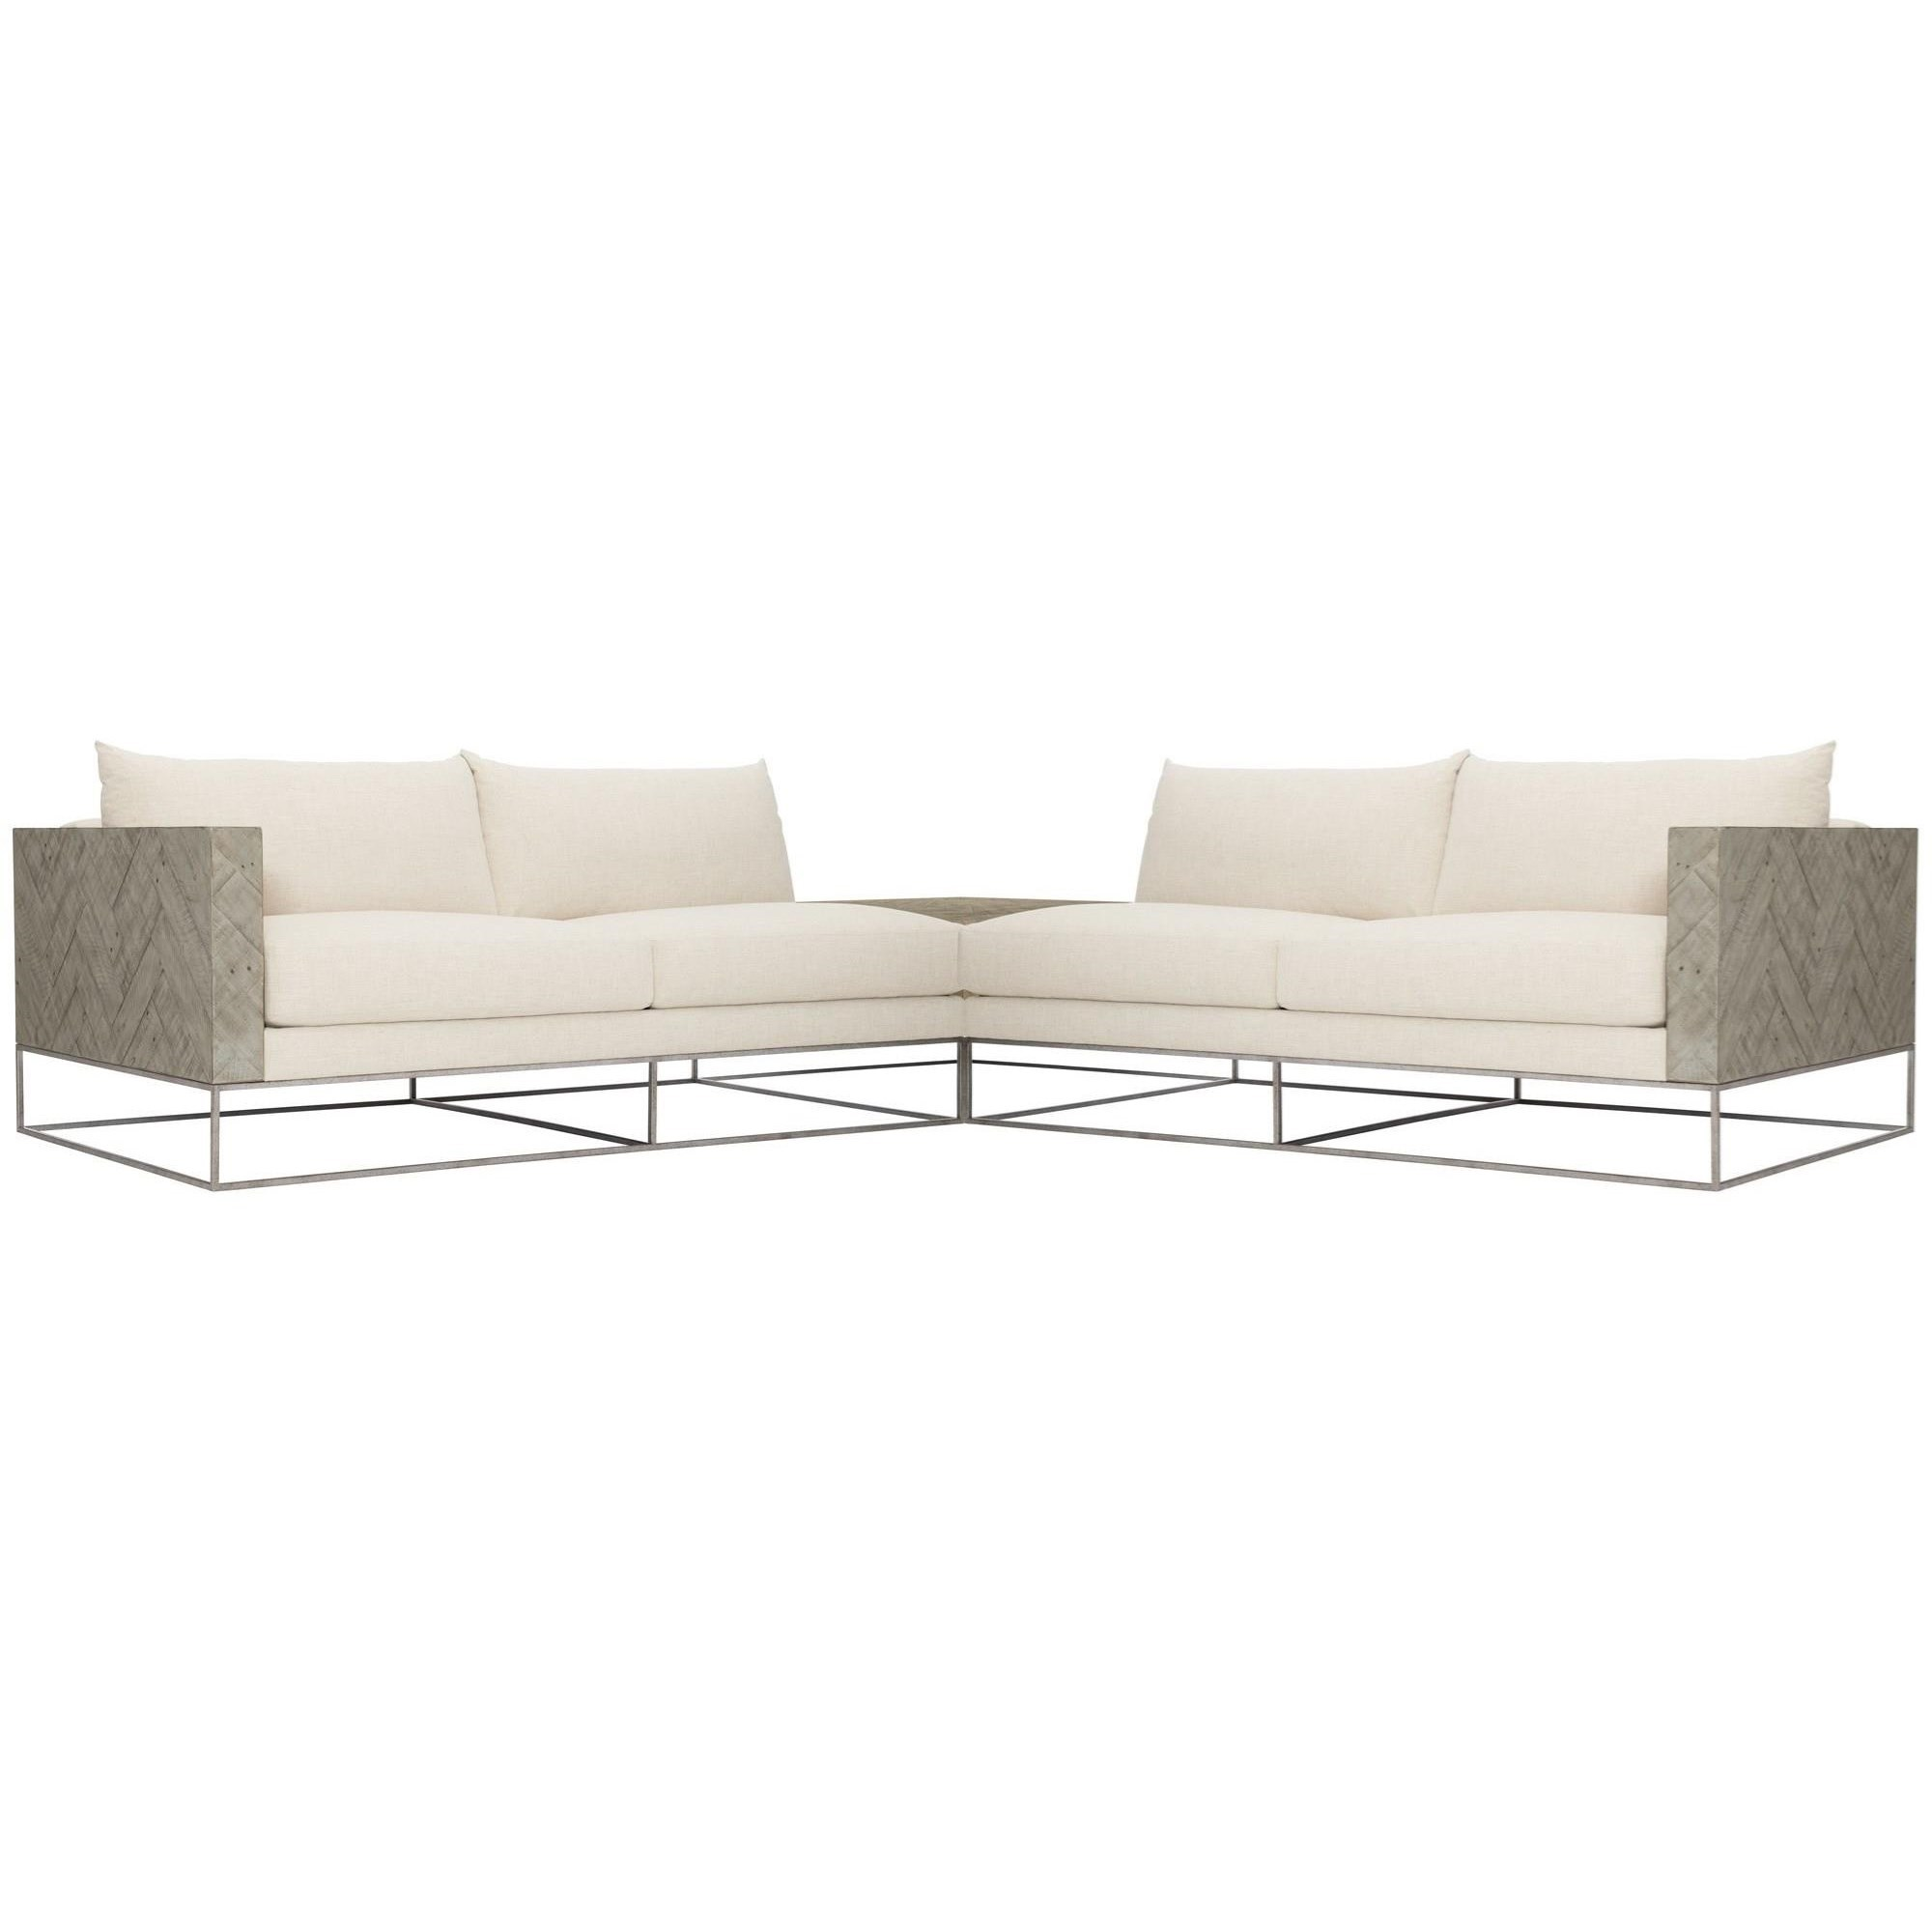 Superb Bernhardt Loft Brooklyn L9042 L9020O L9041 Contemporary Creativecarmelina Interior Chair Design Creativecarmelinacom